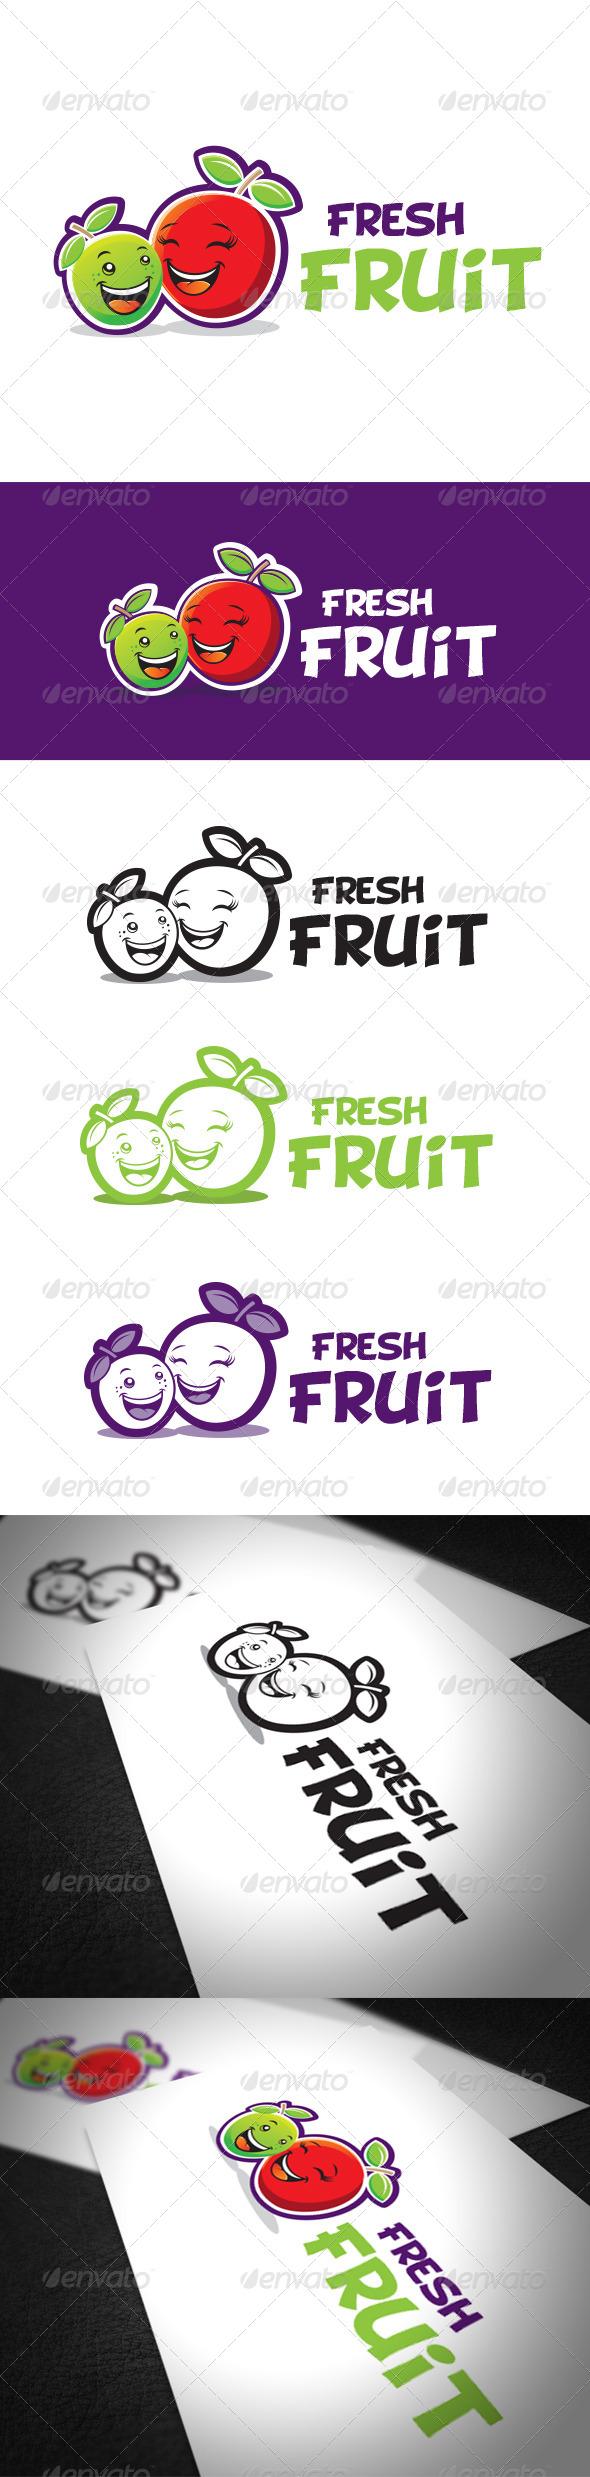 GraphicRiver Fresh Fruit Logo Template 6325816